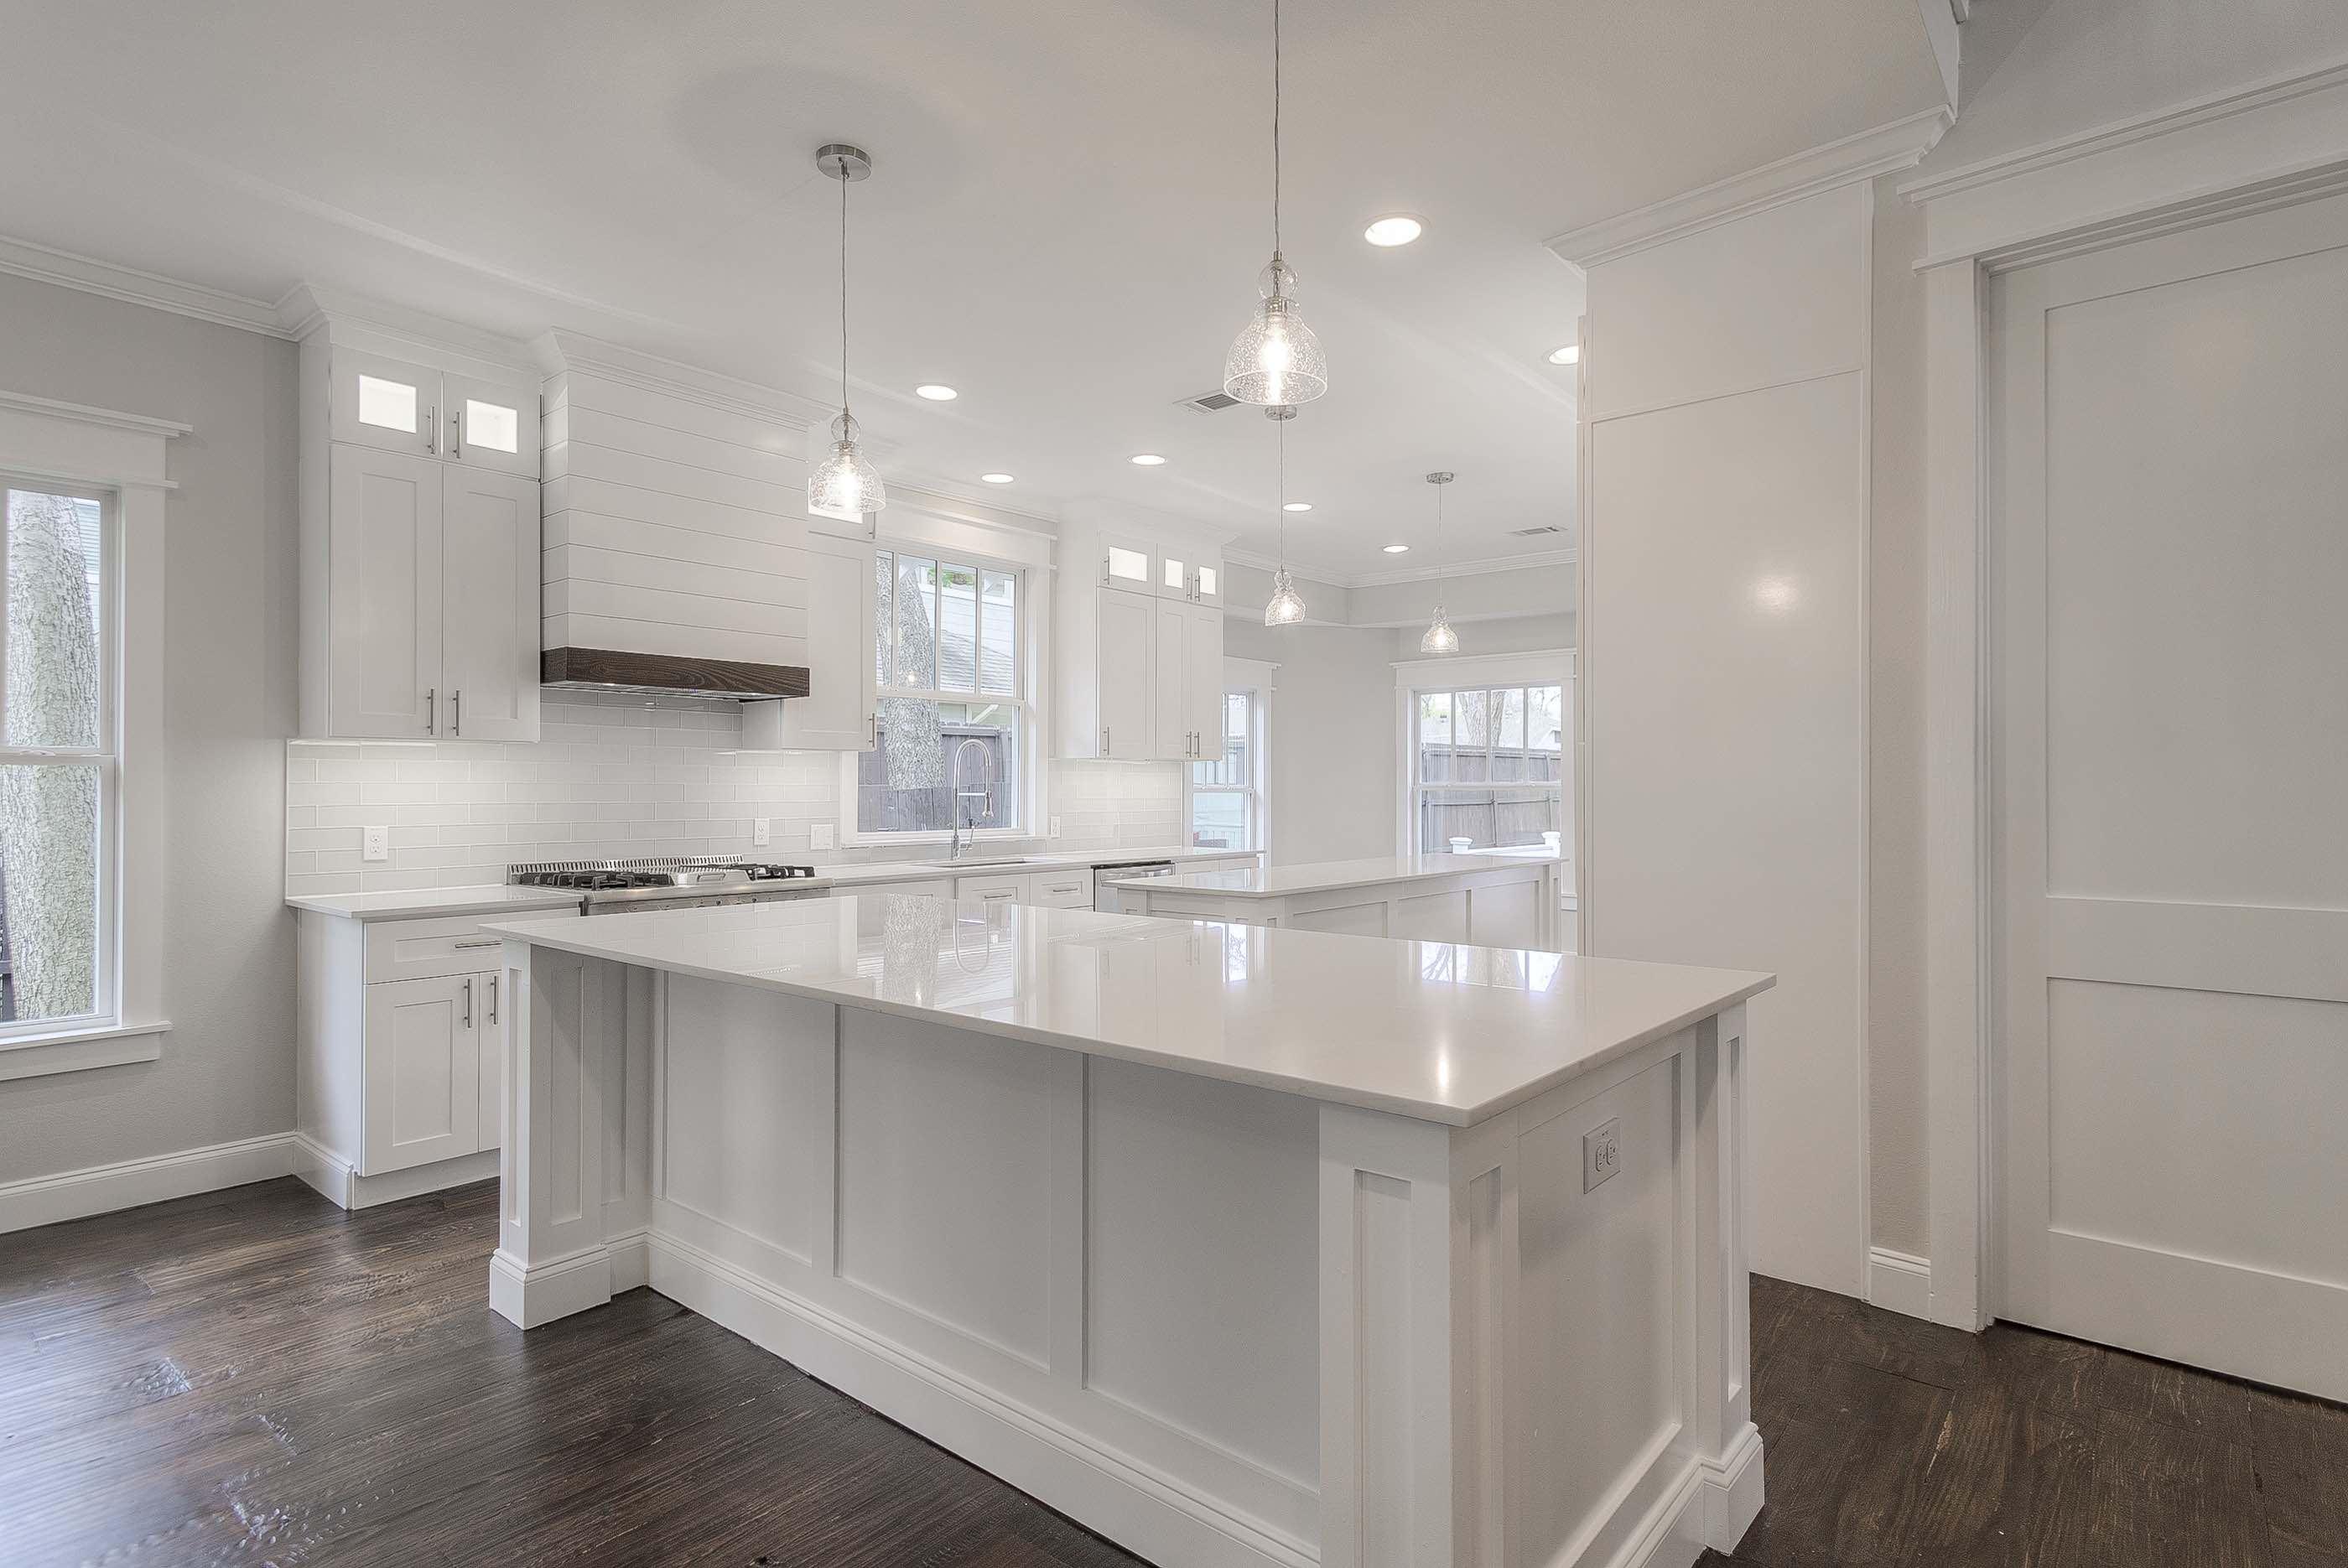 9 - kitchen - island - angle.jpg